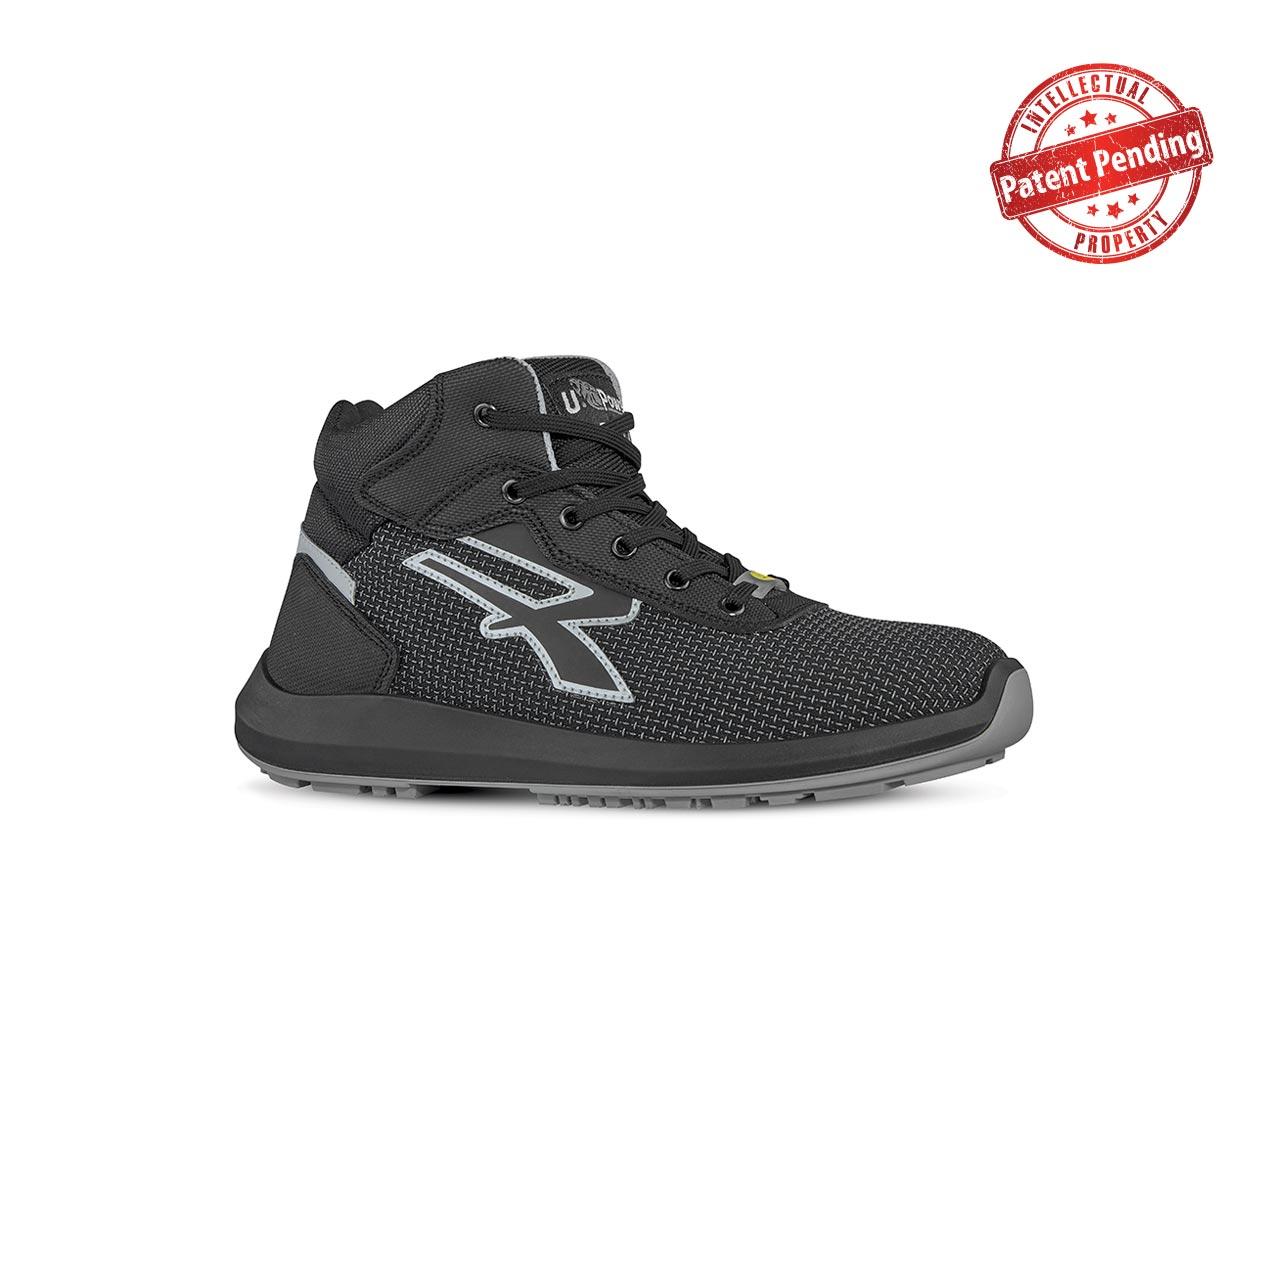 scarpa antinfortunistica alta upower modello velar linea redup vista laterale